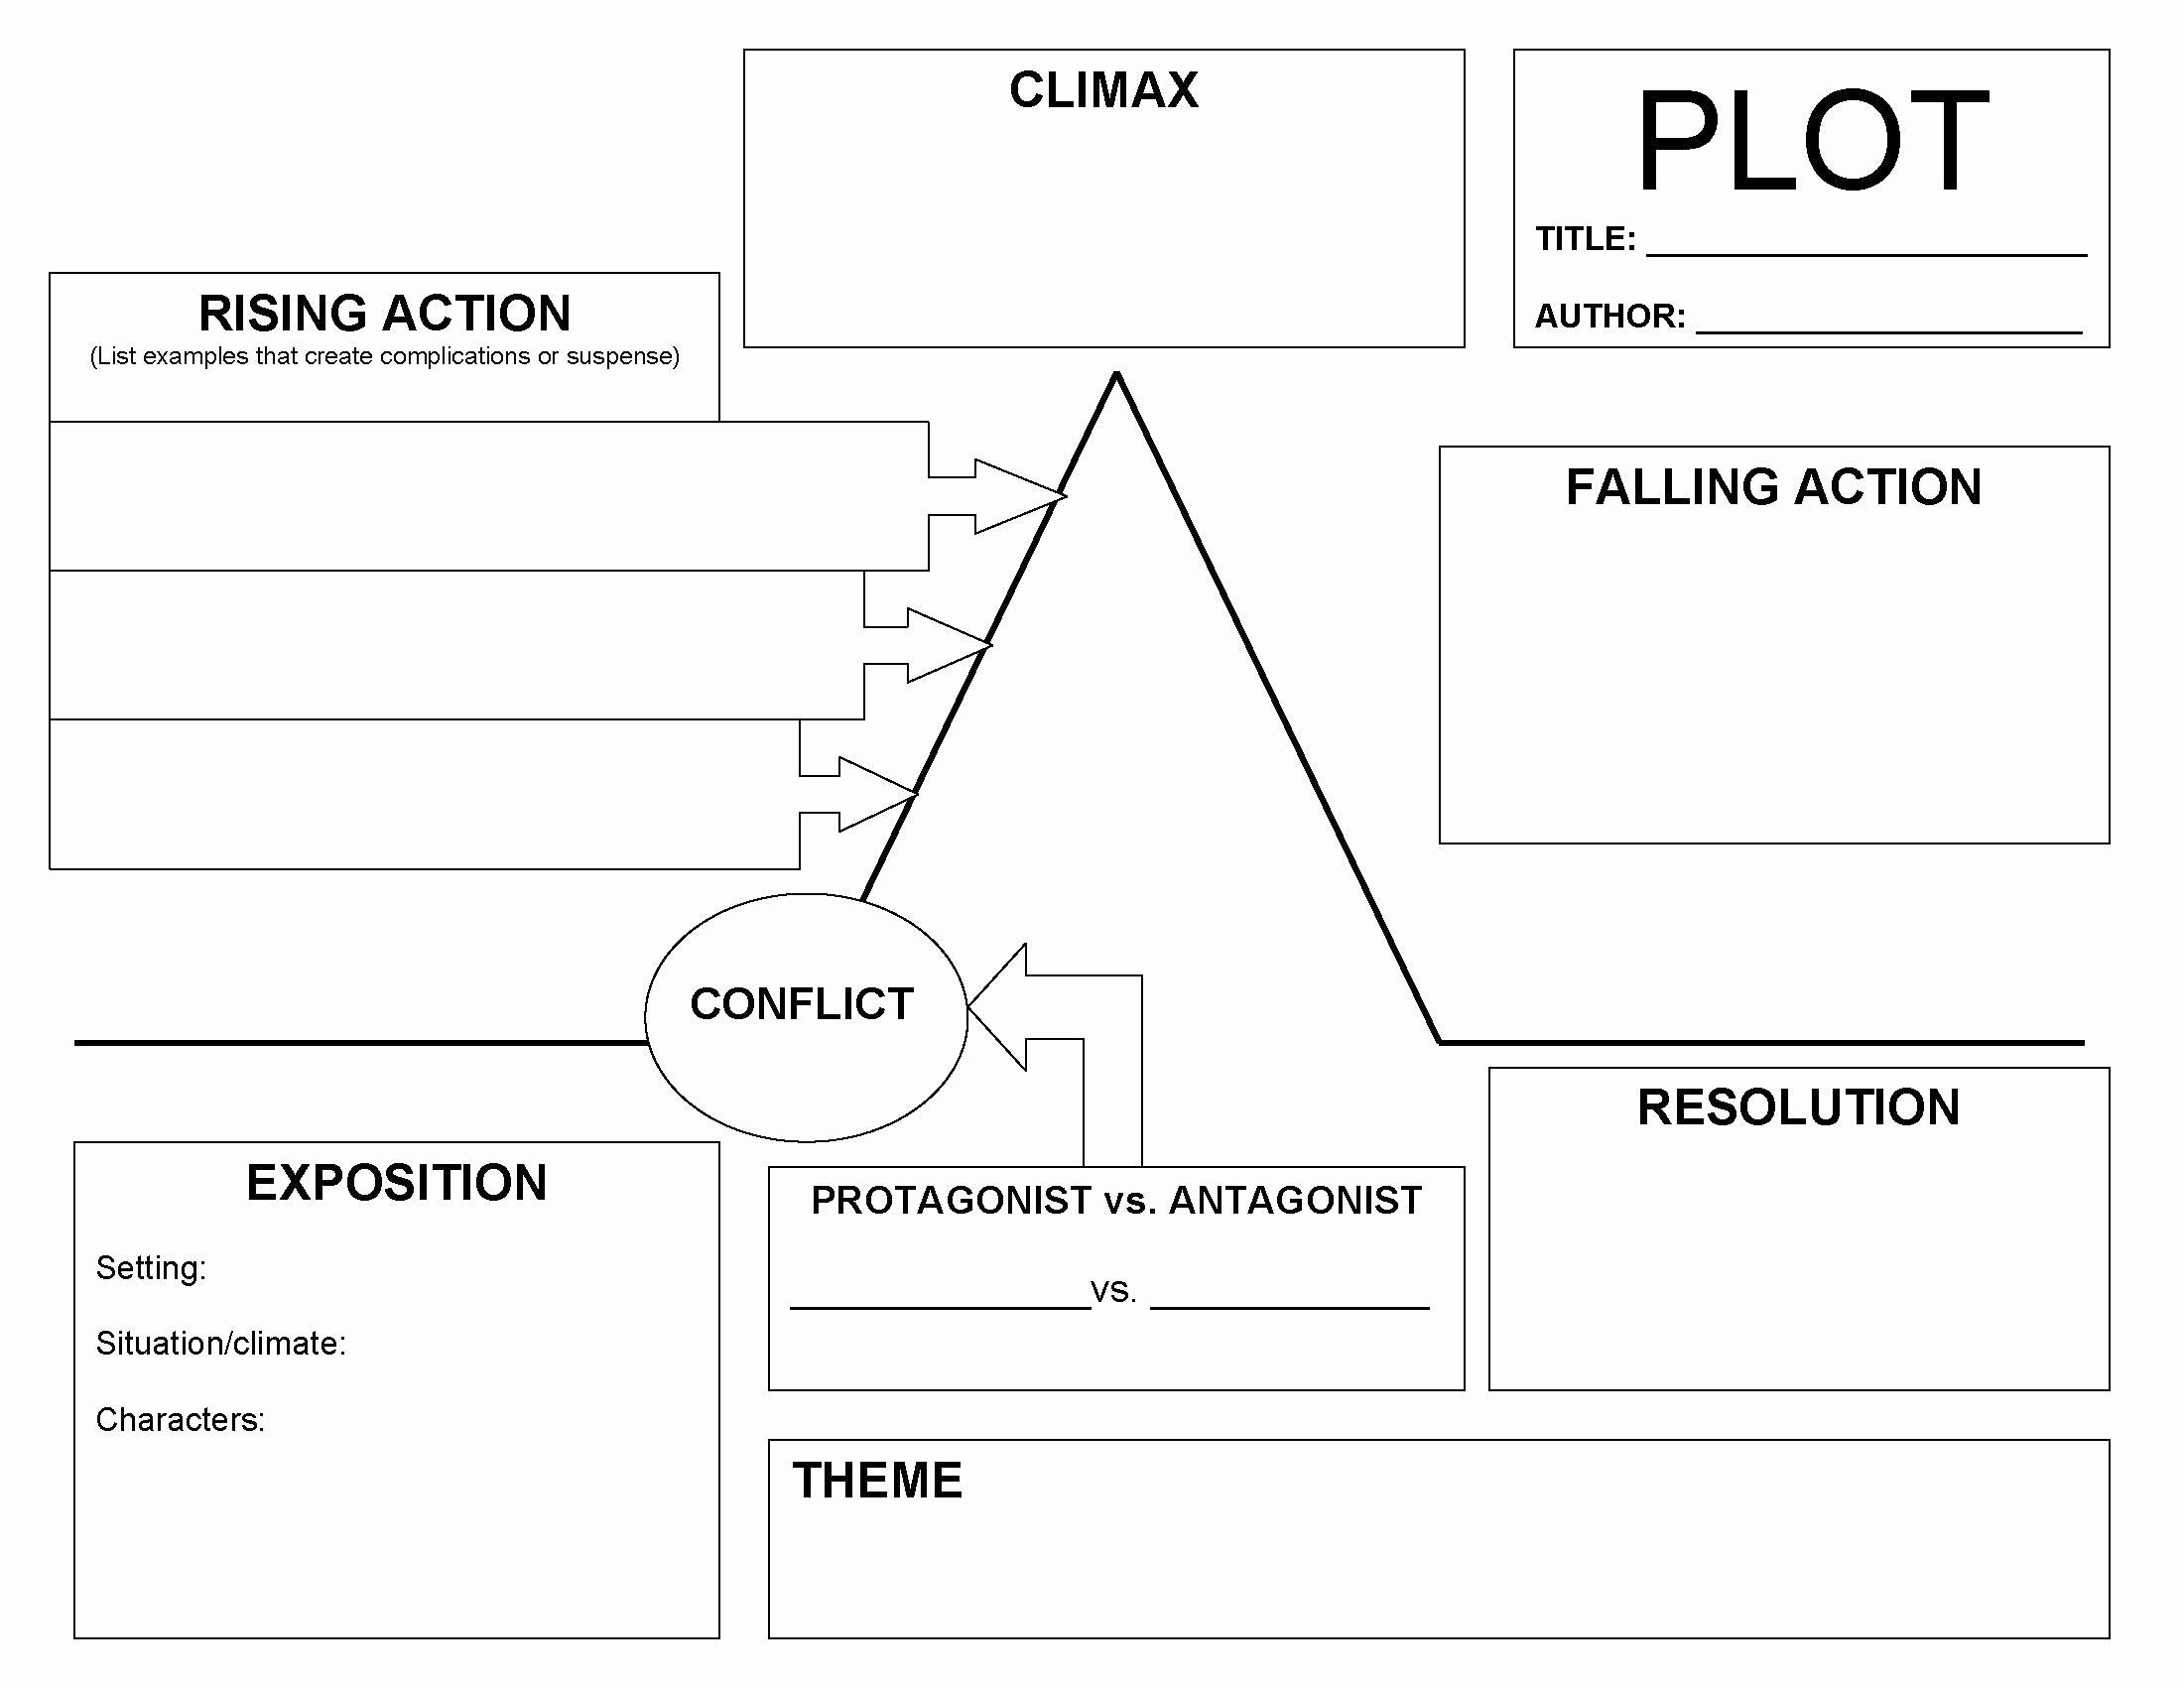 Plot Diagram Graphic Organizer Elegant Scriptwriting Plot Graphic Organizer Plot Graphic Organizer Story Outline Template Teaching Plot [ 1701 x 2201 Pixel ]